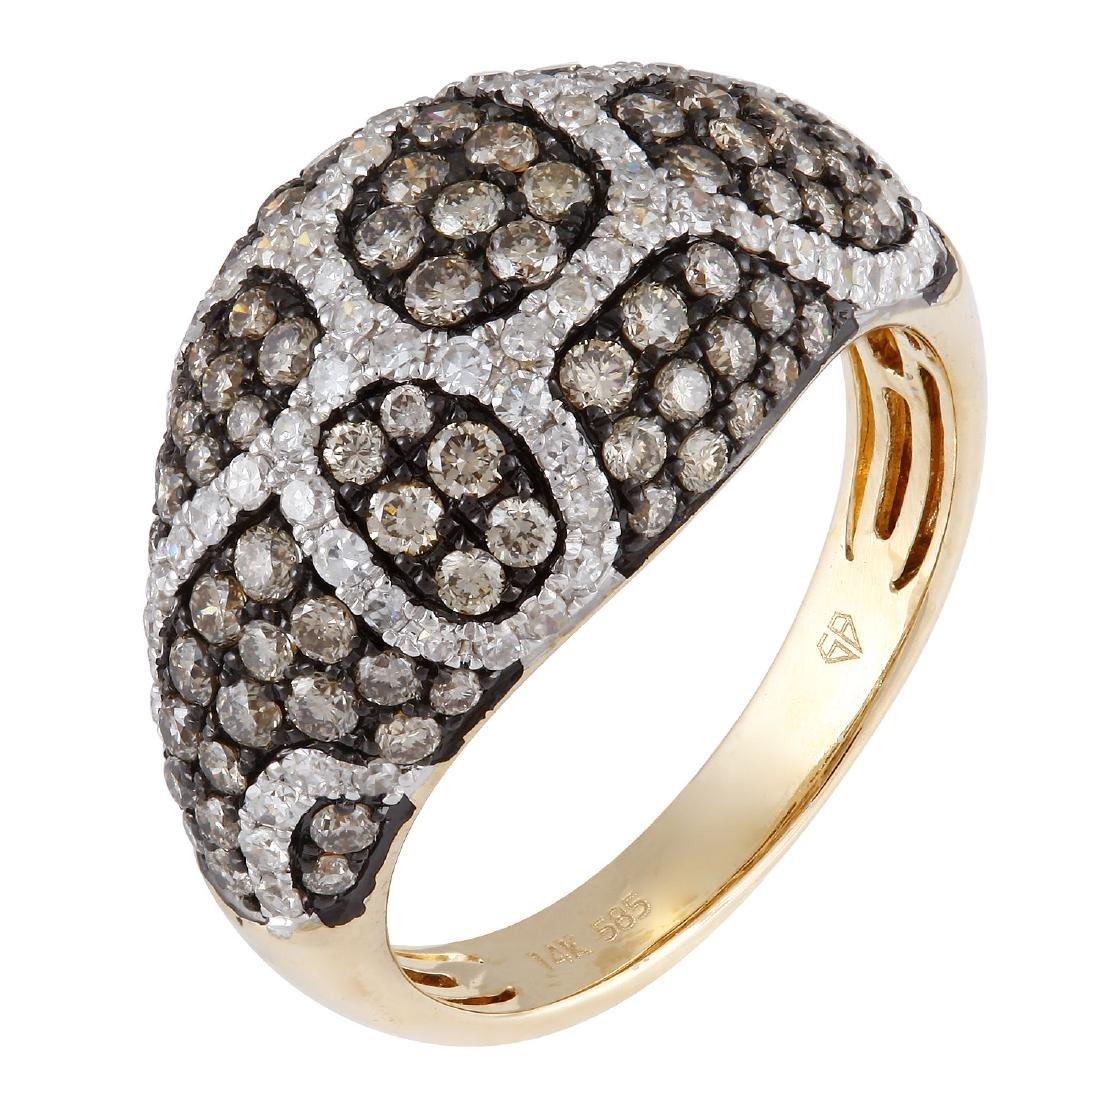 14KT Yellow Gold 1.79ctw Women's Diamond Cocktail Ring